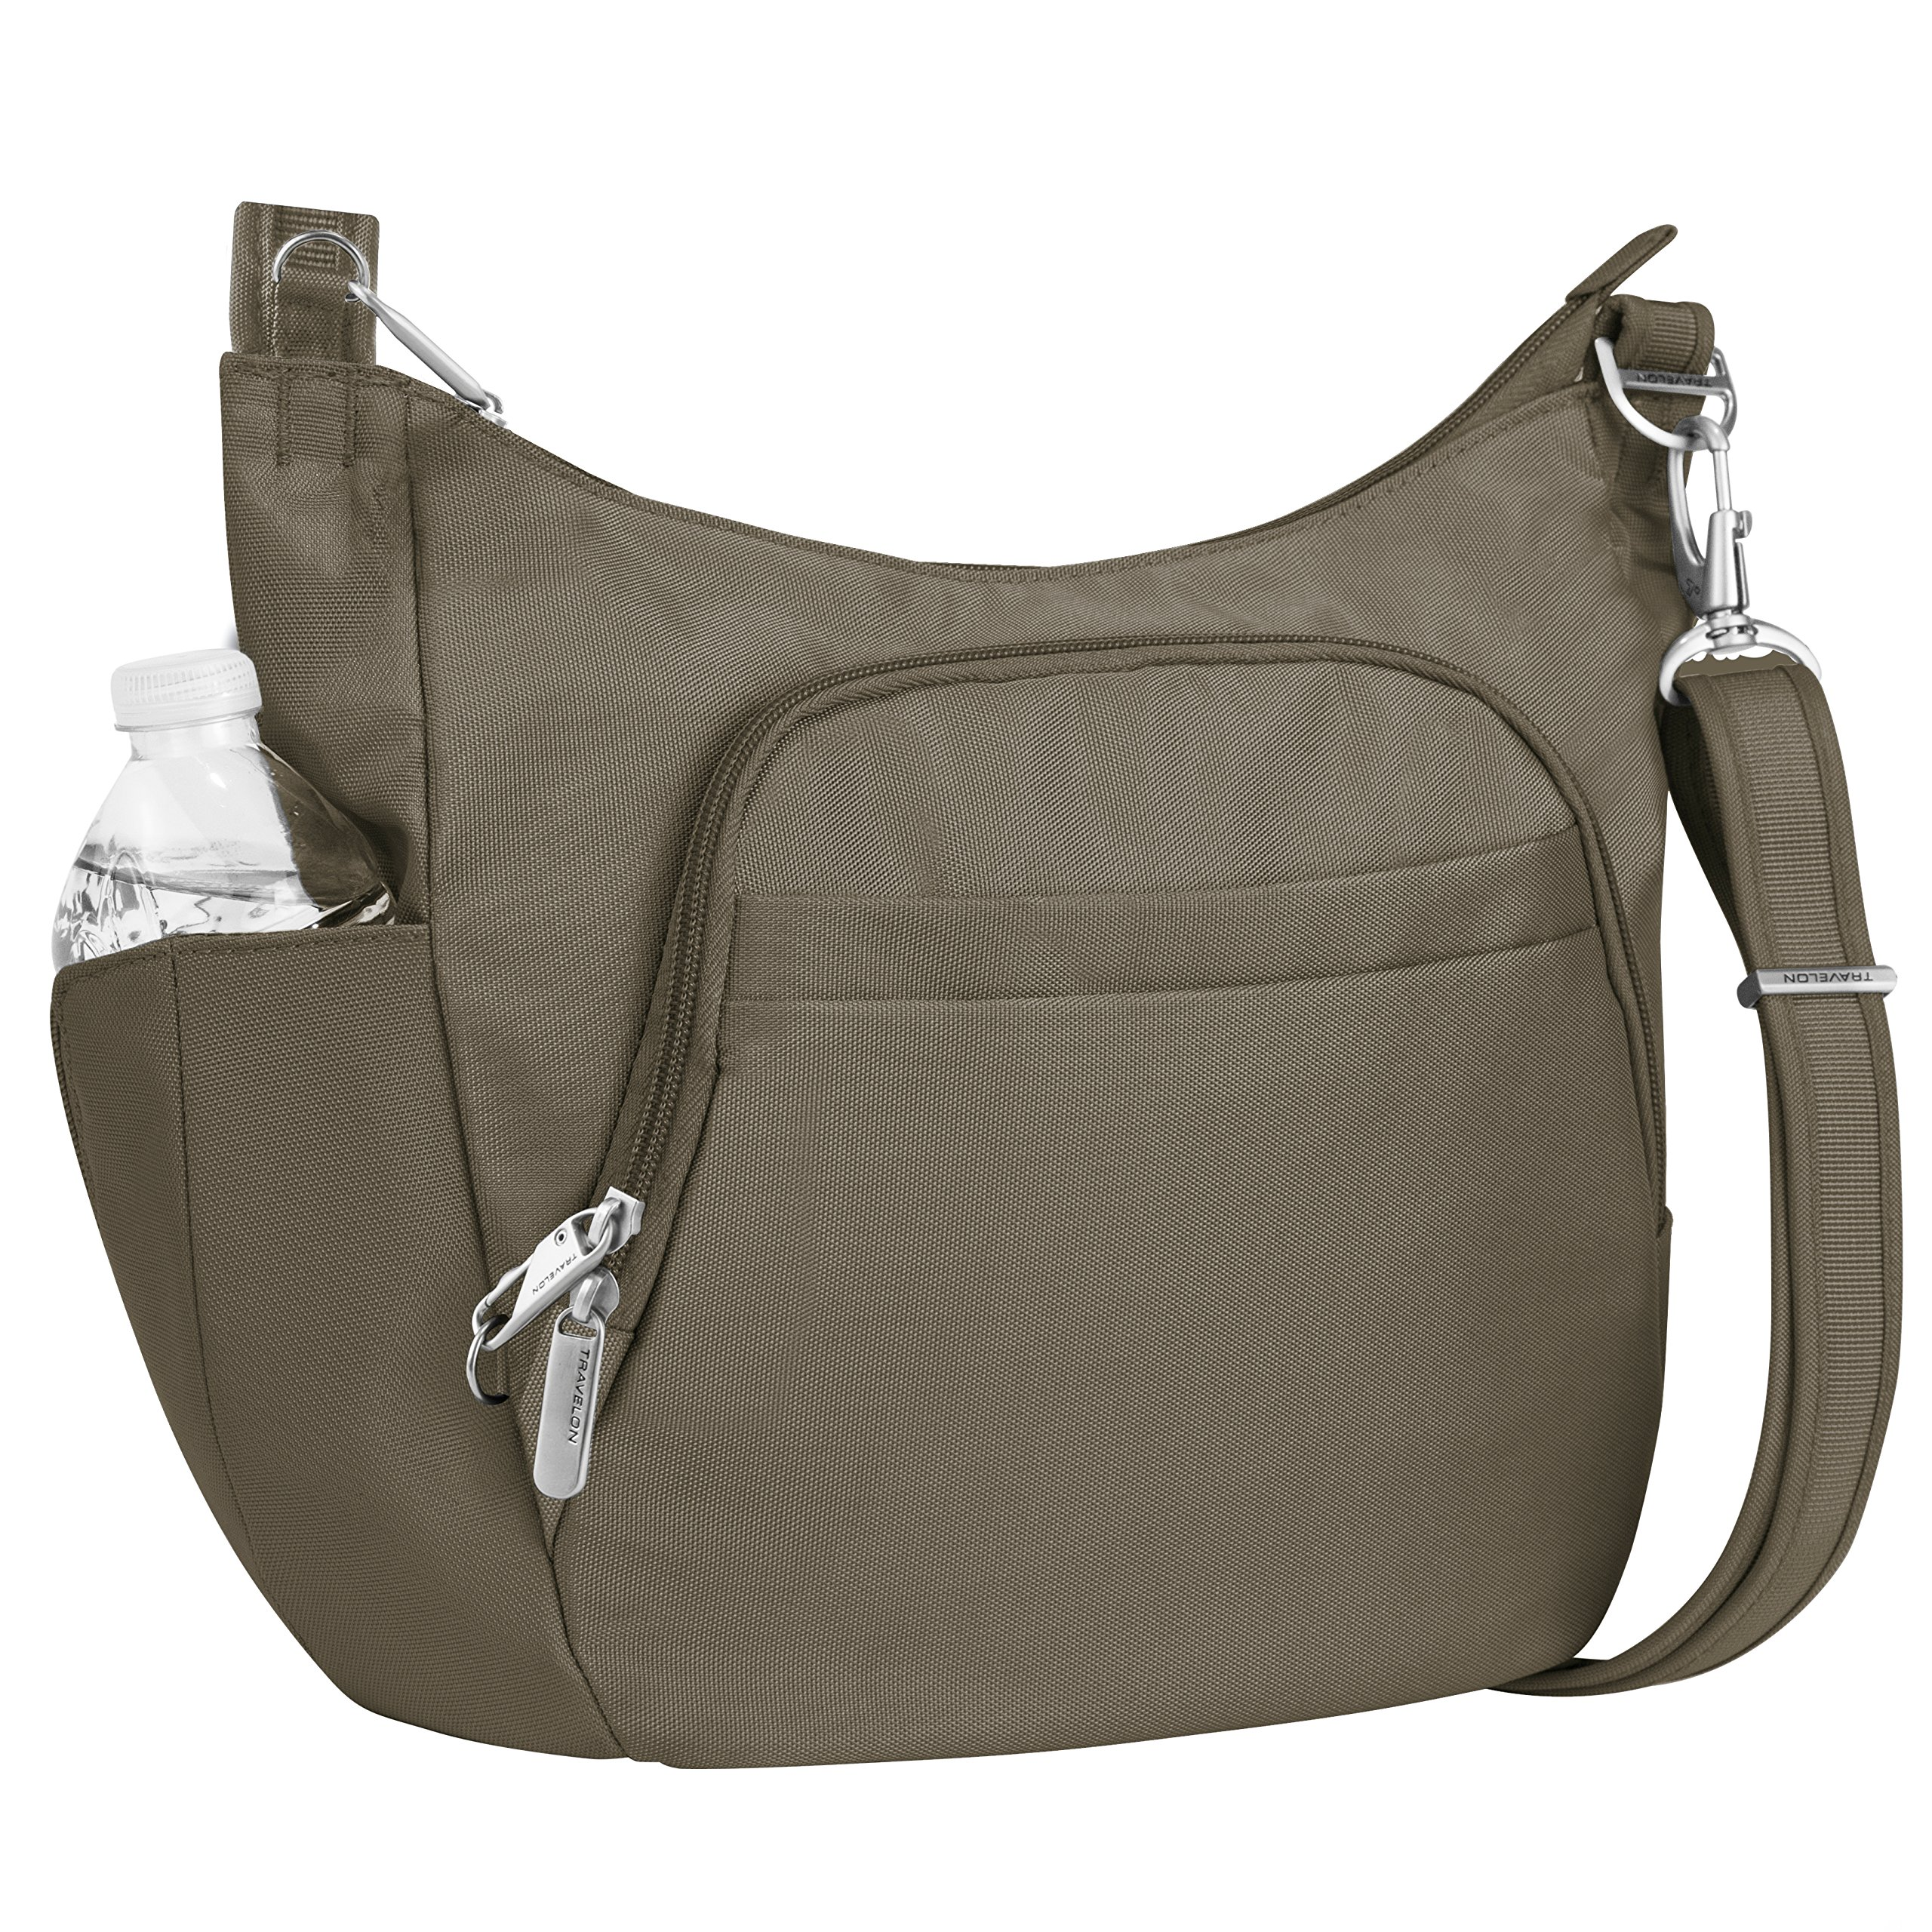 Travelon Anti-theft Classic Crossbody Bucket Bag, Nutmeg by Travelon